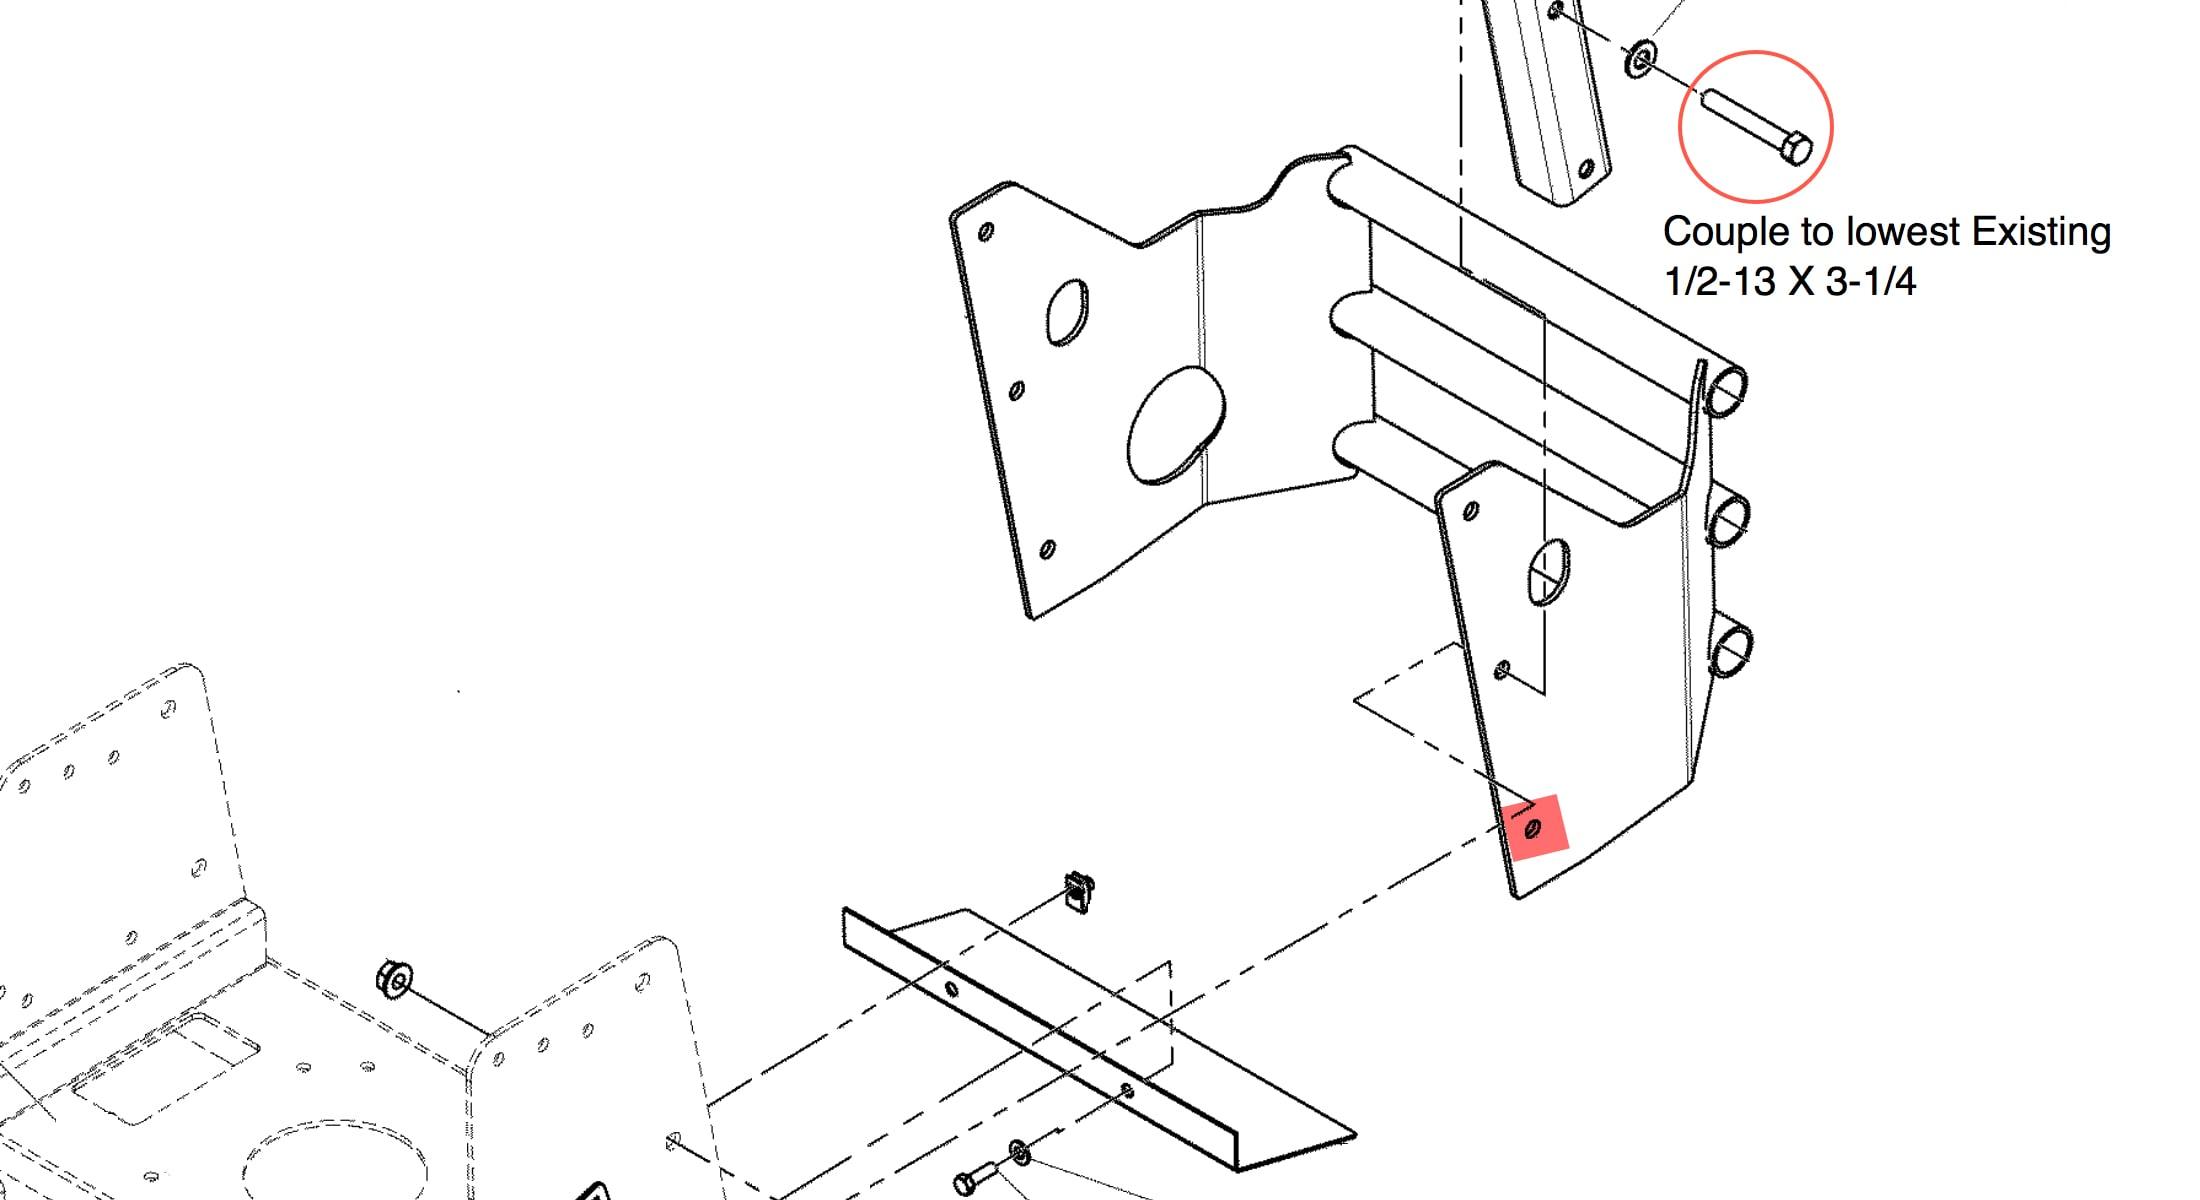 Ferris Is500z Wiring Diagram Trusted Checkmate Light Box Lawn Striper For Bush Hog